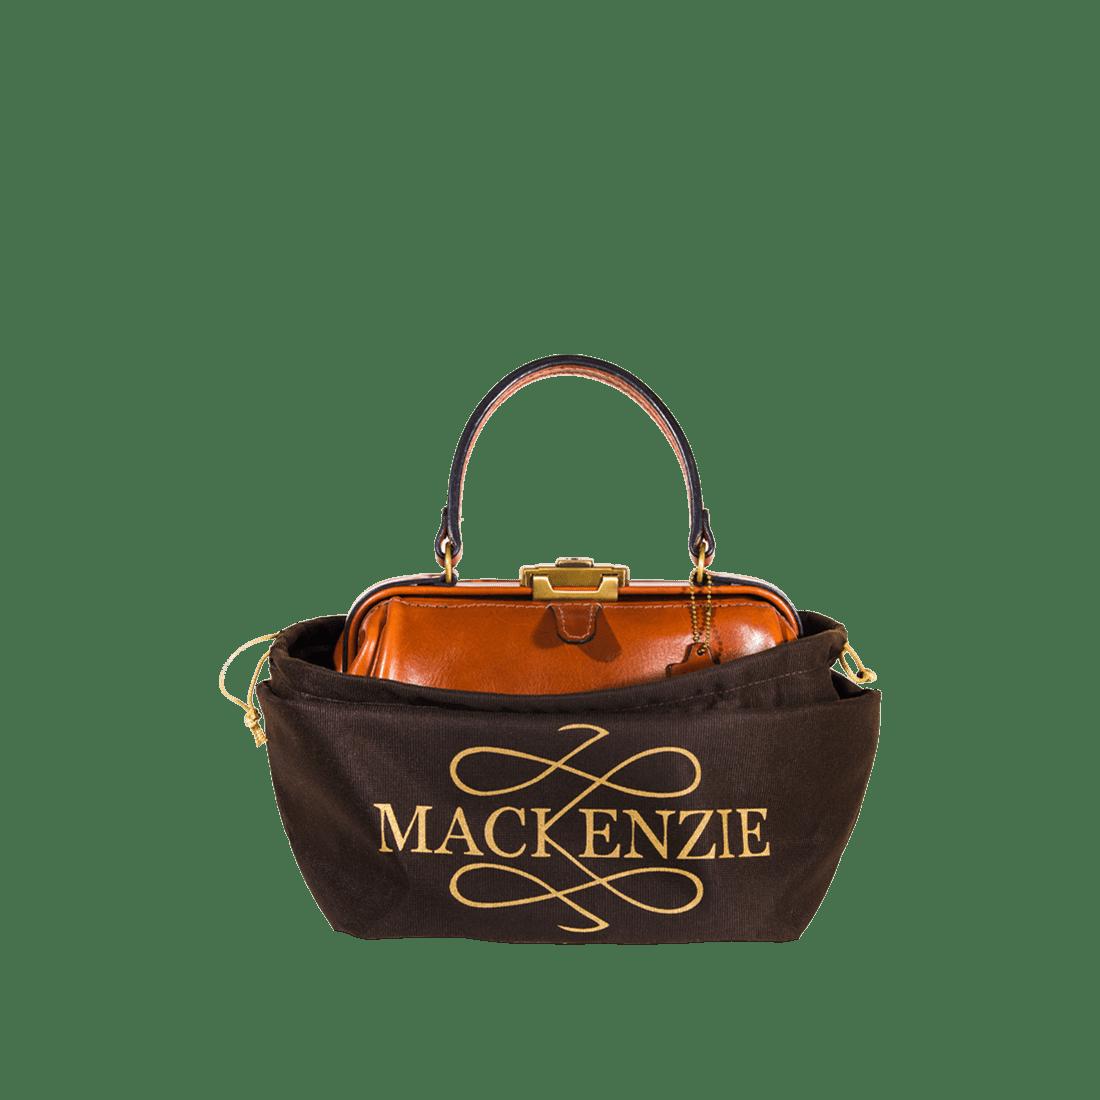 Mackenzie dustbag